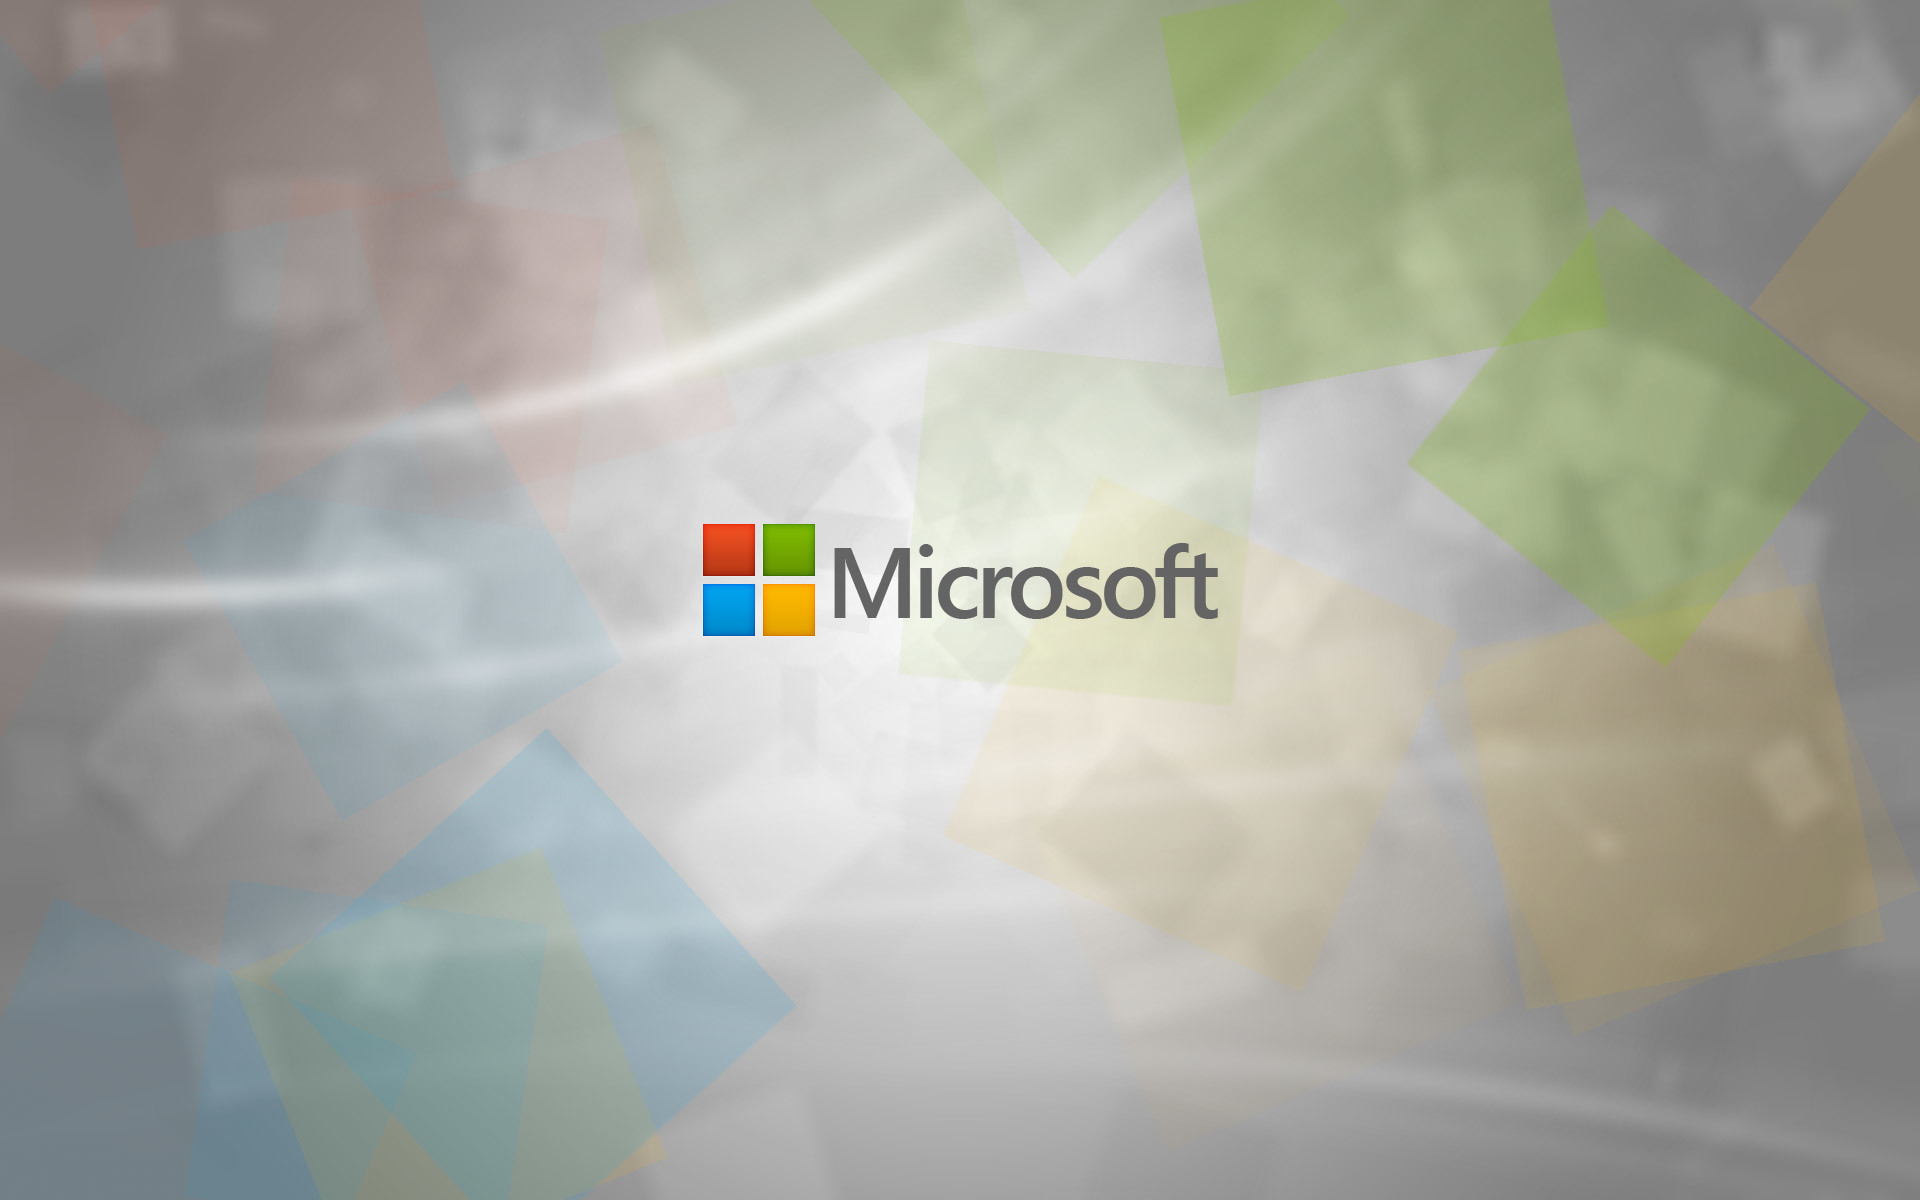 Microsoft Screensavers and Wallpaper 60 images